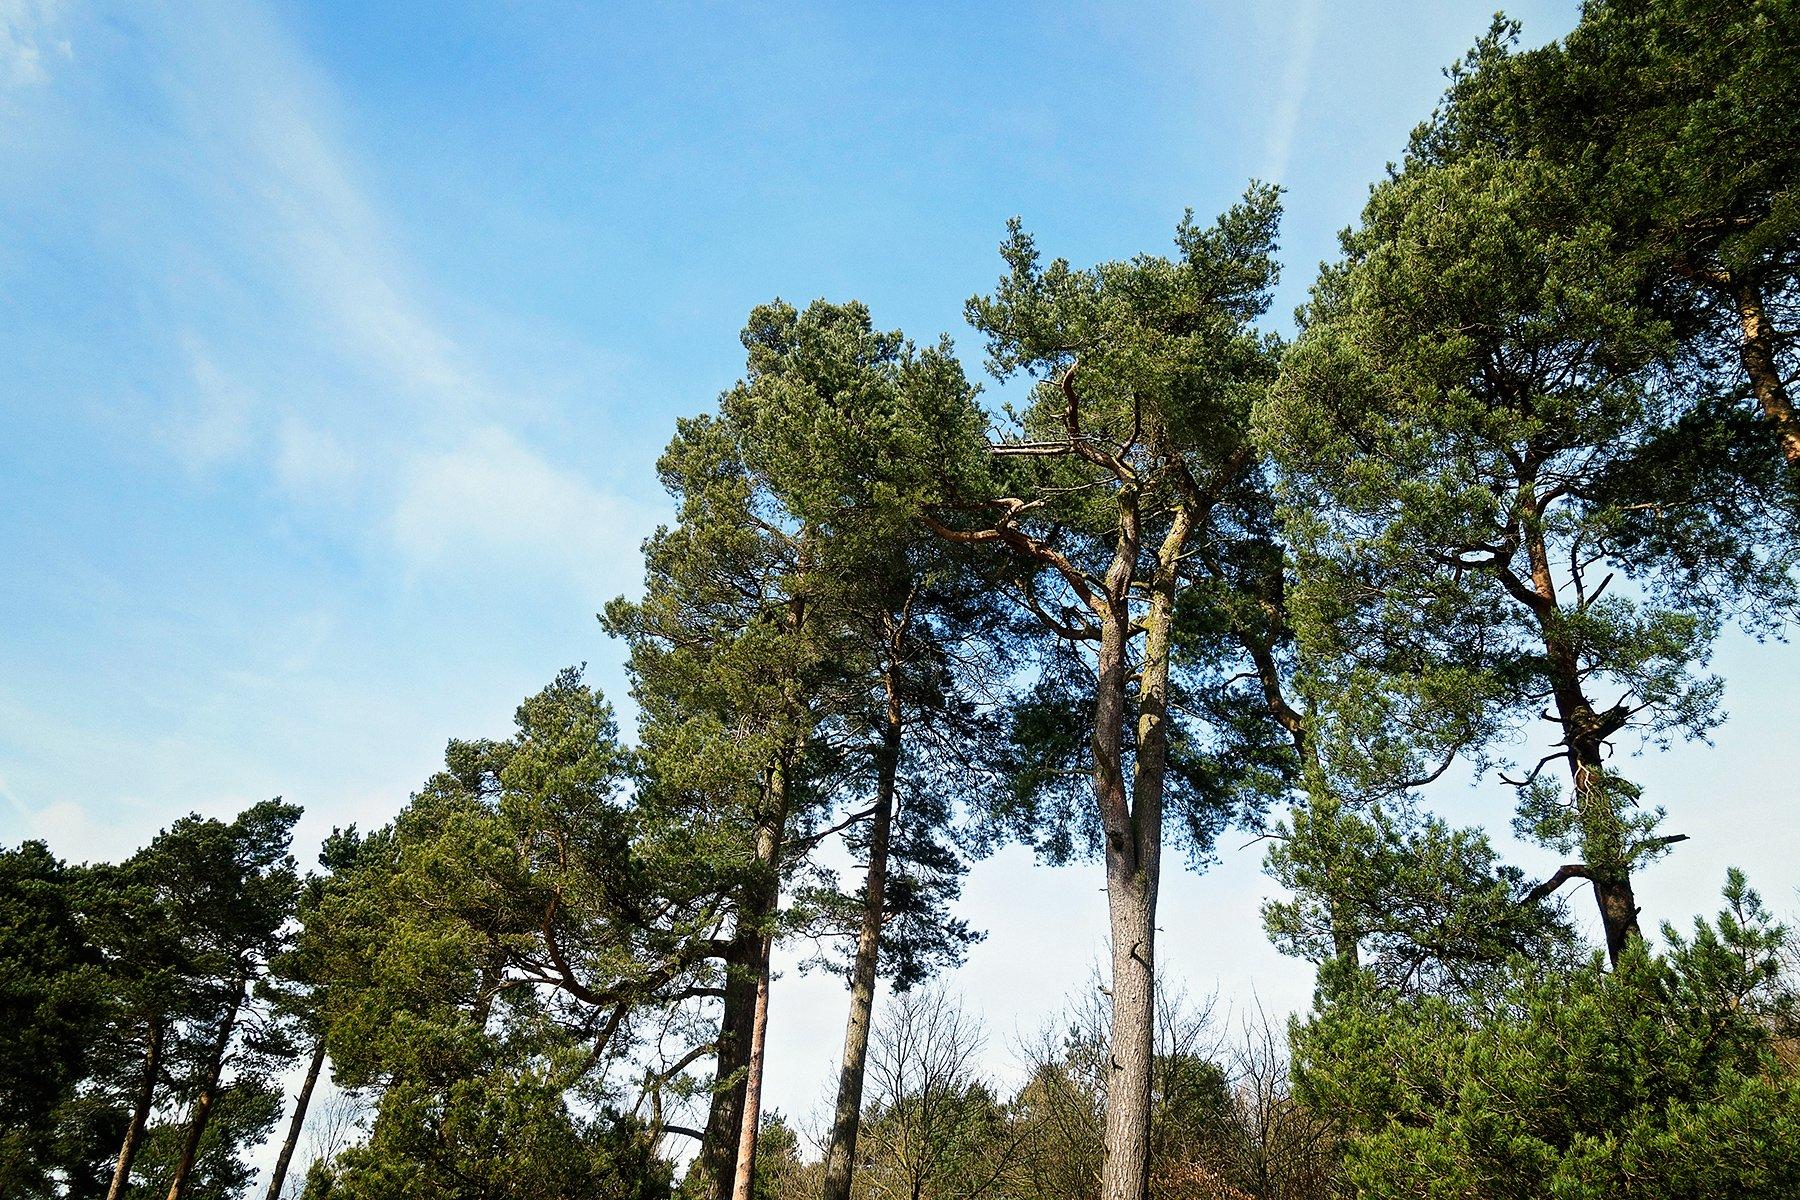 Longshaw pine trees